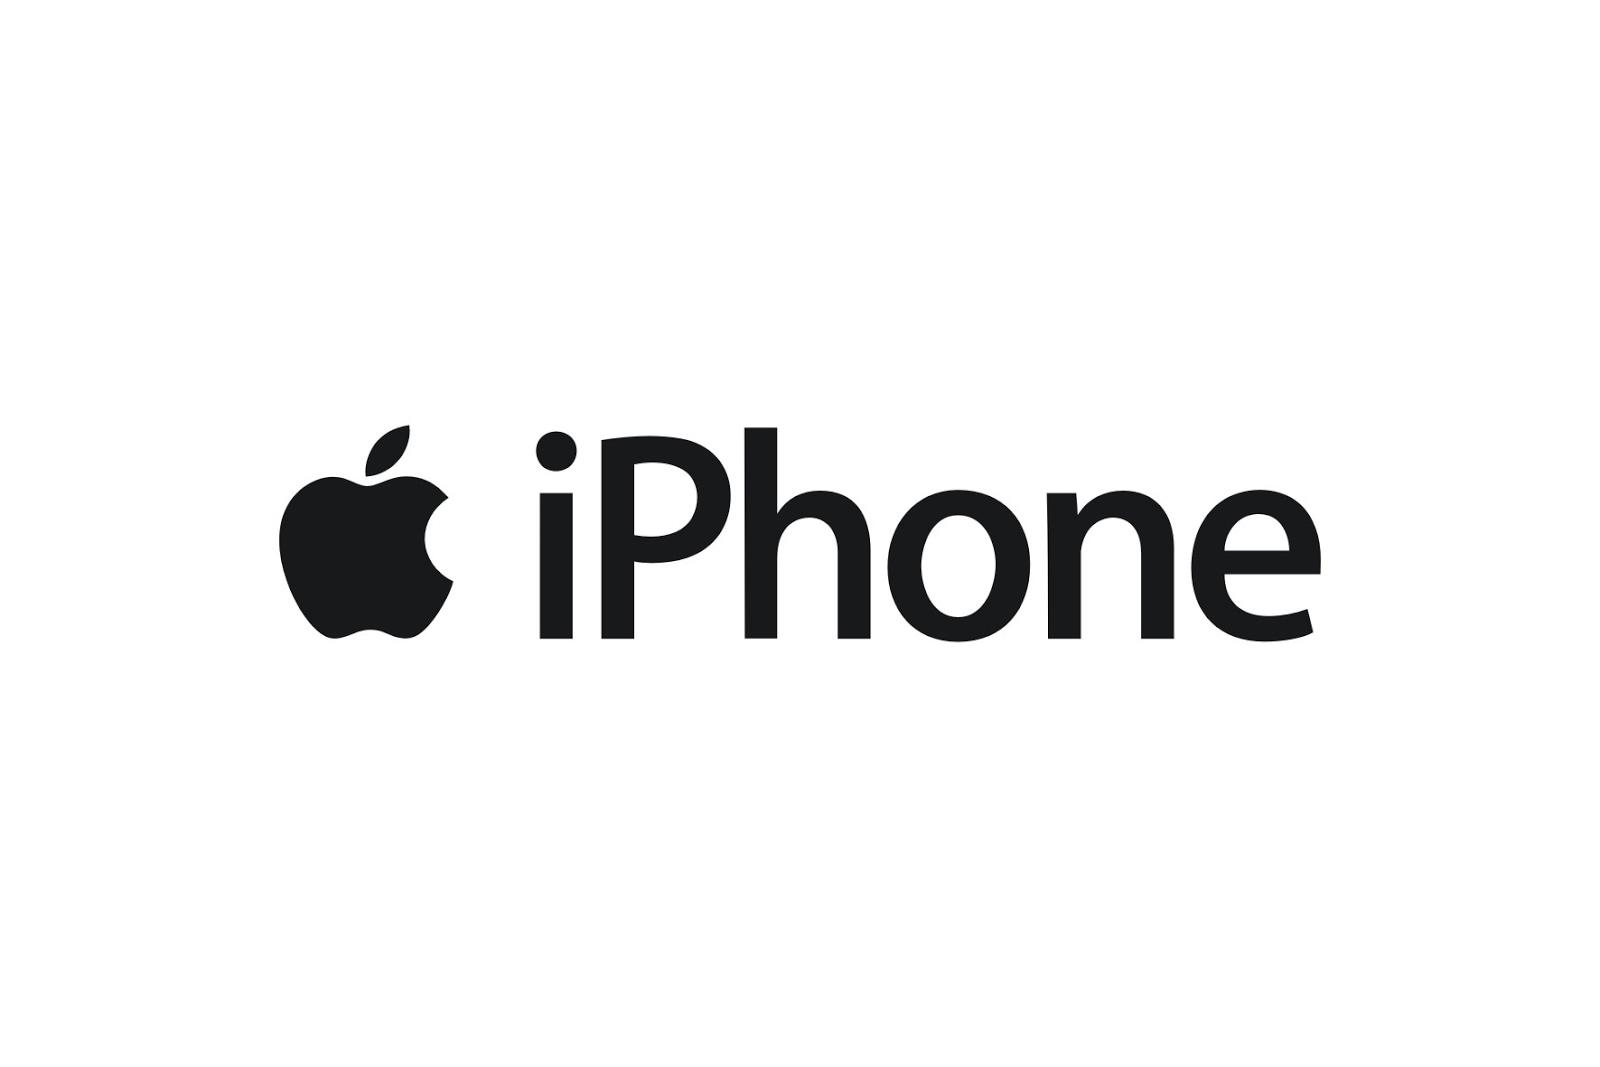 Blej iPhone t prdorur n mimet si m posht